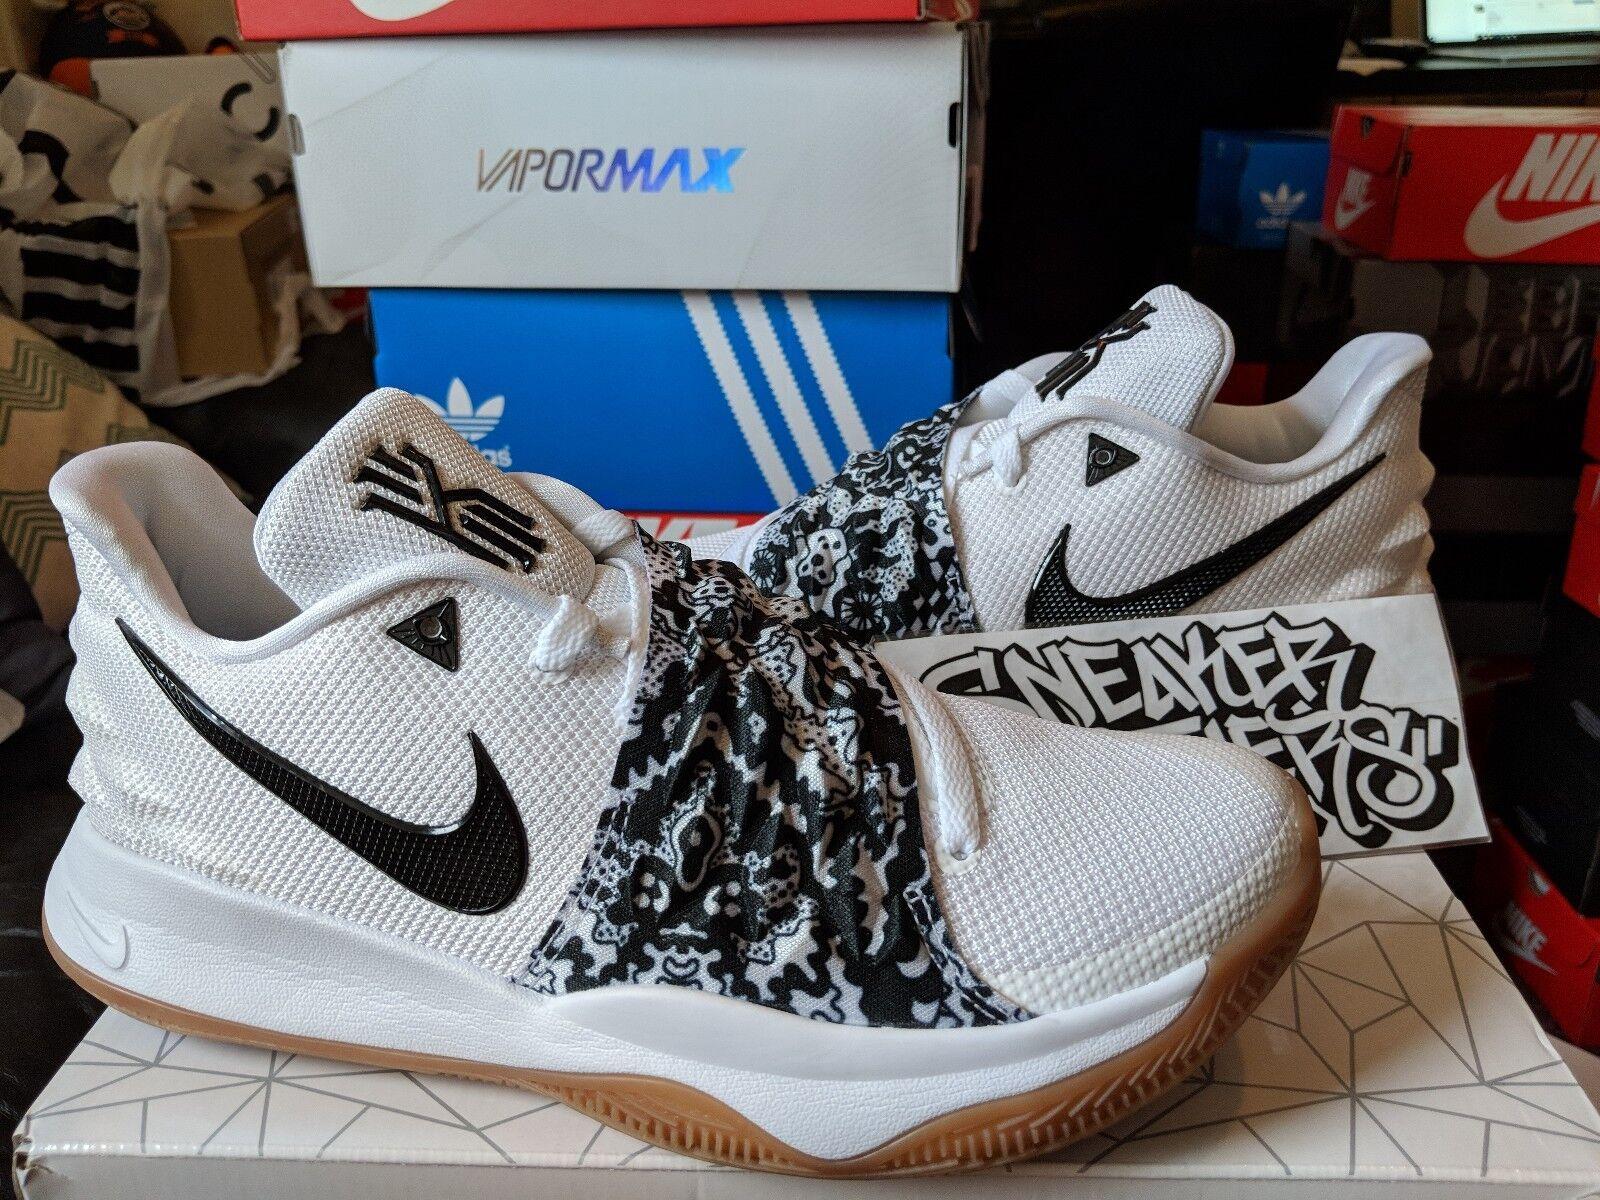 Nike Kyrie IV 4 Low White Black Gum Bottom Basketball Irving Men's AO8979-100 Cheap women's shoes women's shoes